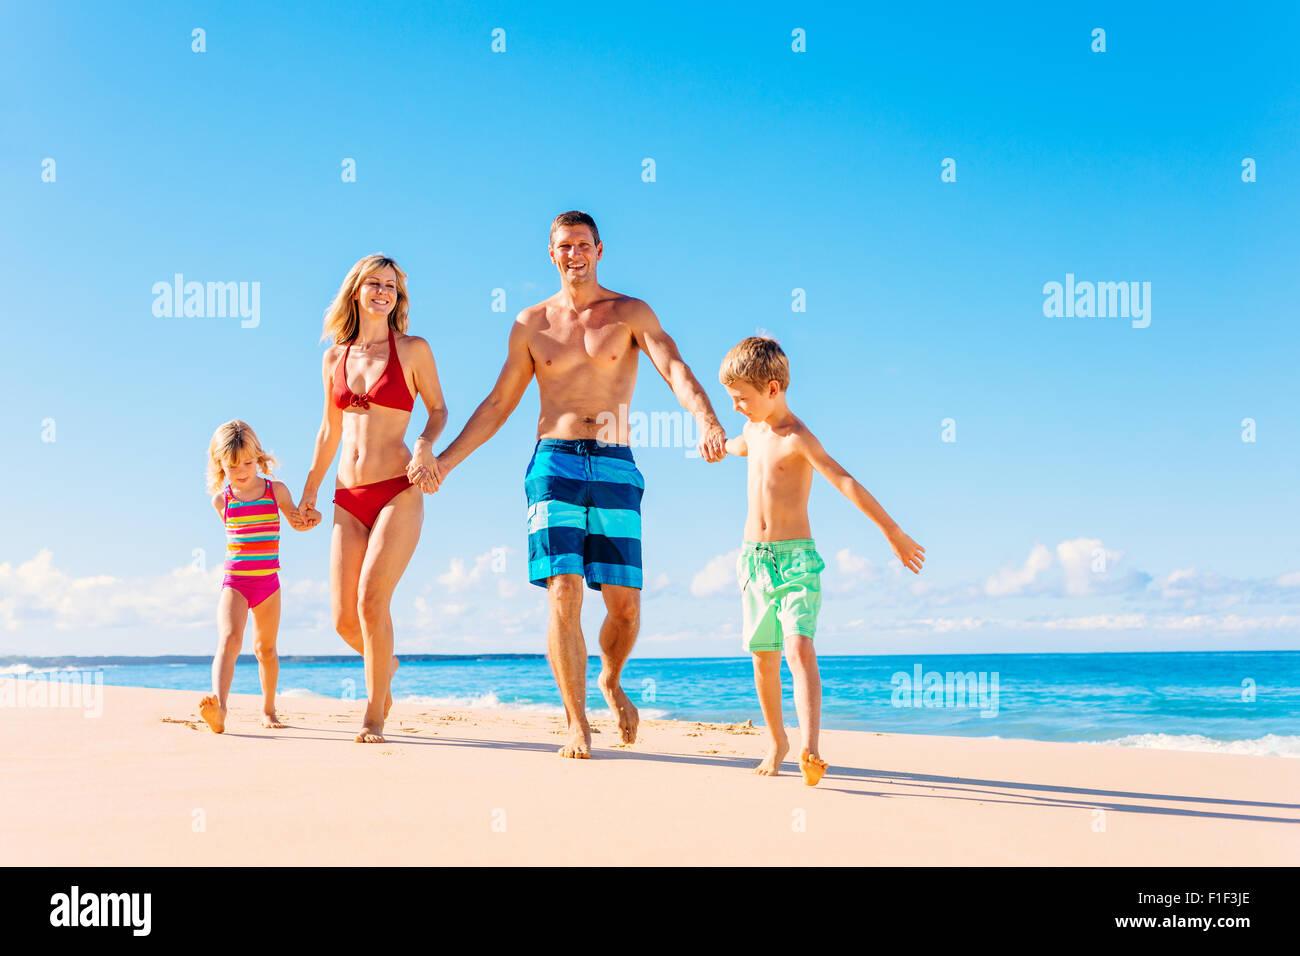 Family vacation. Happy family having fun on beautiful warm sunny beach. Summer lifestyle - Stock Image